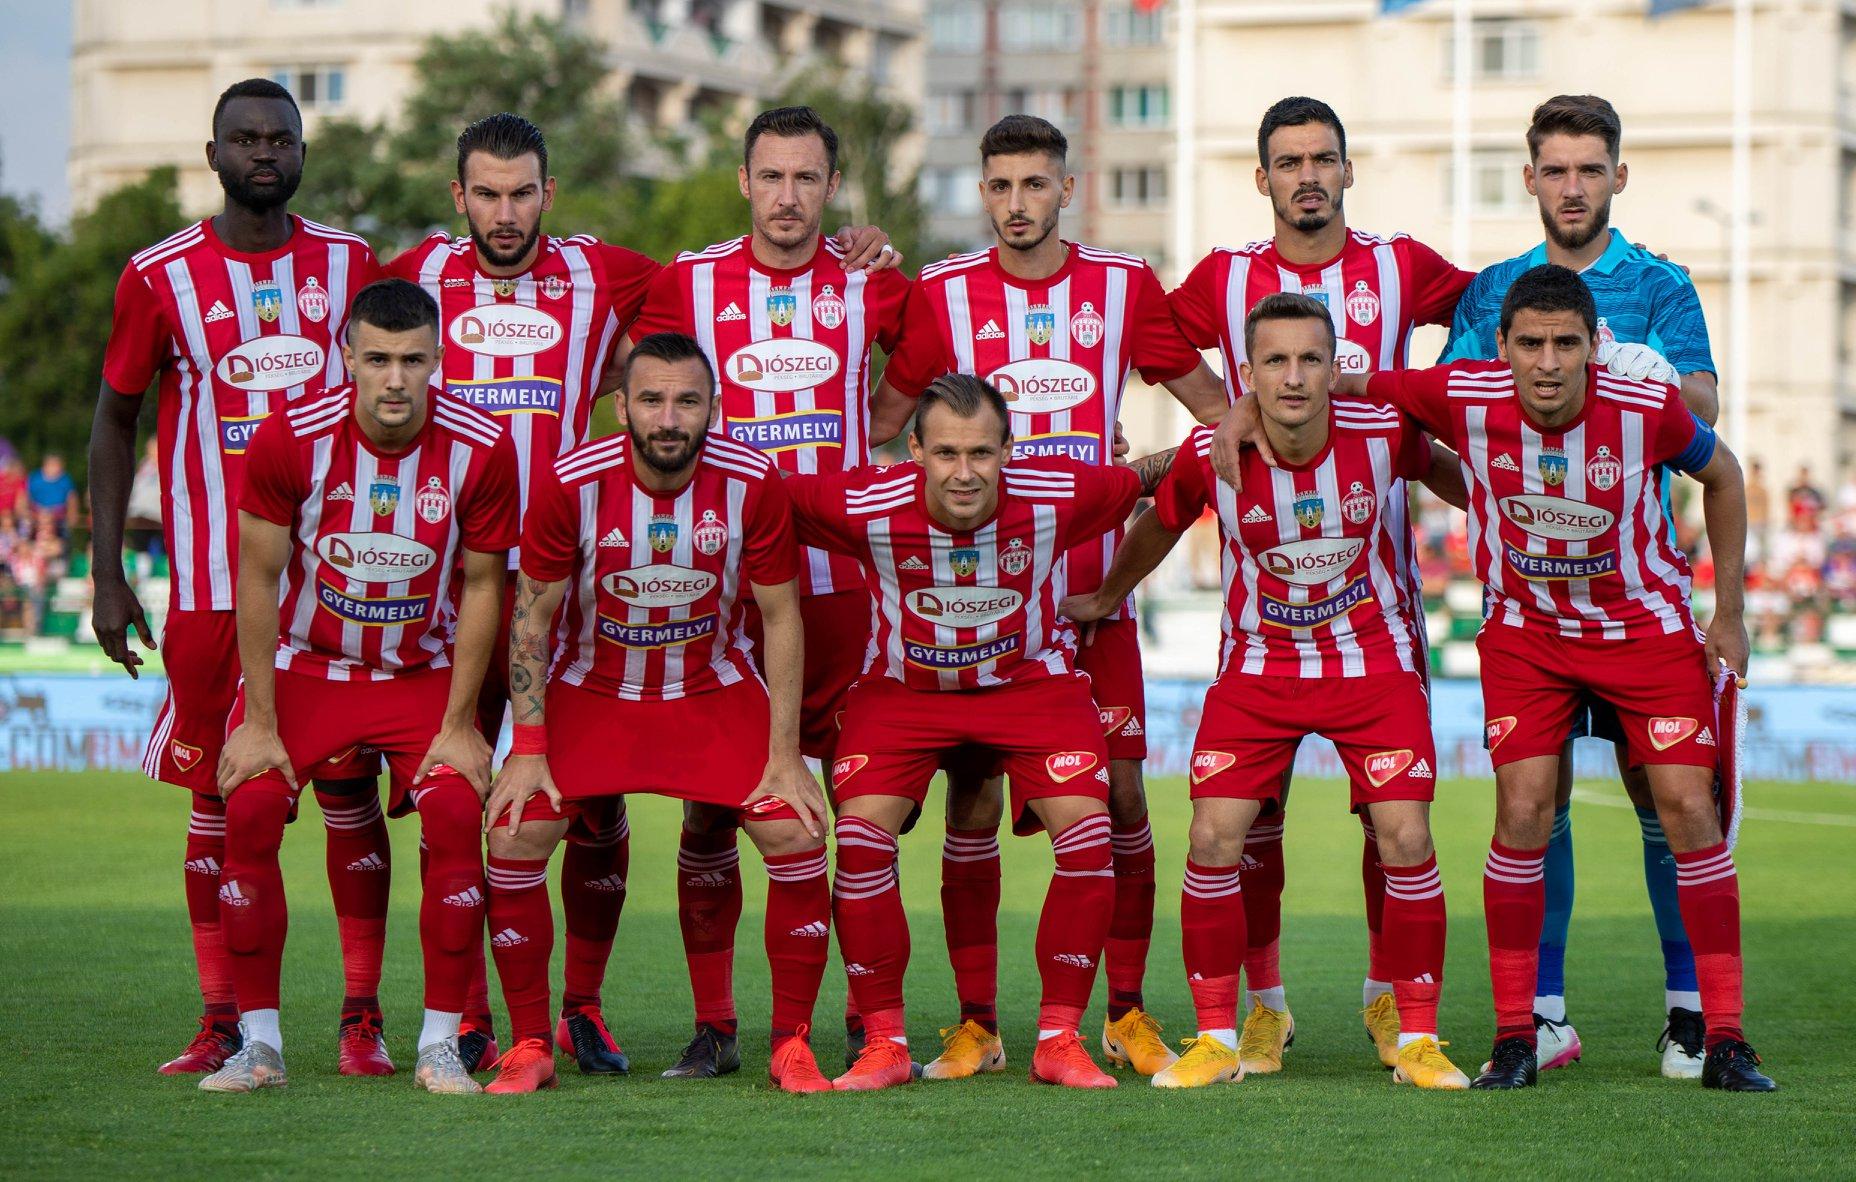 UEFA - SEPSI OSK 4 - 5 FC Spartak Trnava